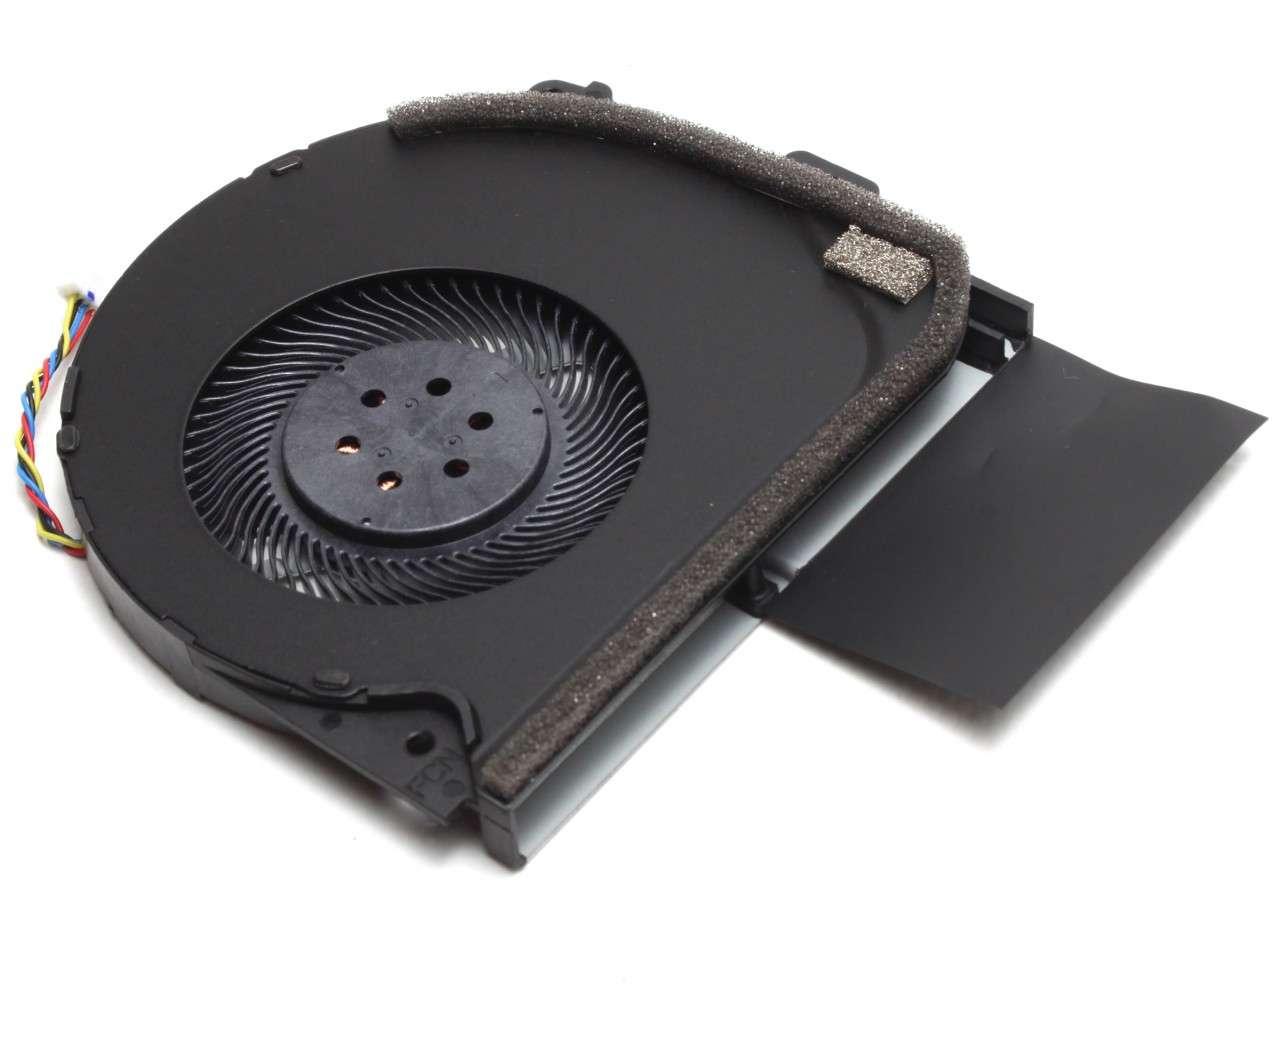 Cooler procesor CPU laptop Asus ROG Strix GL703GS imagine powerlaptop.ro 2021